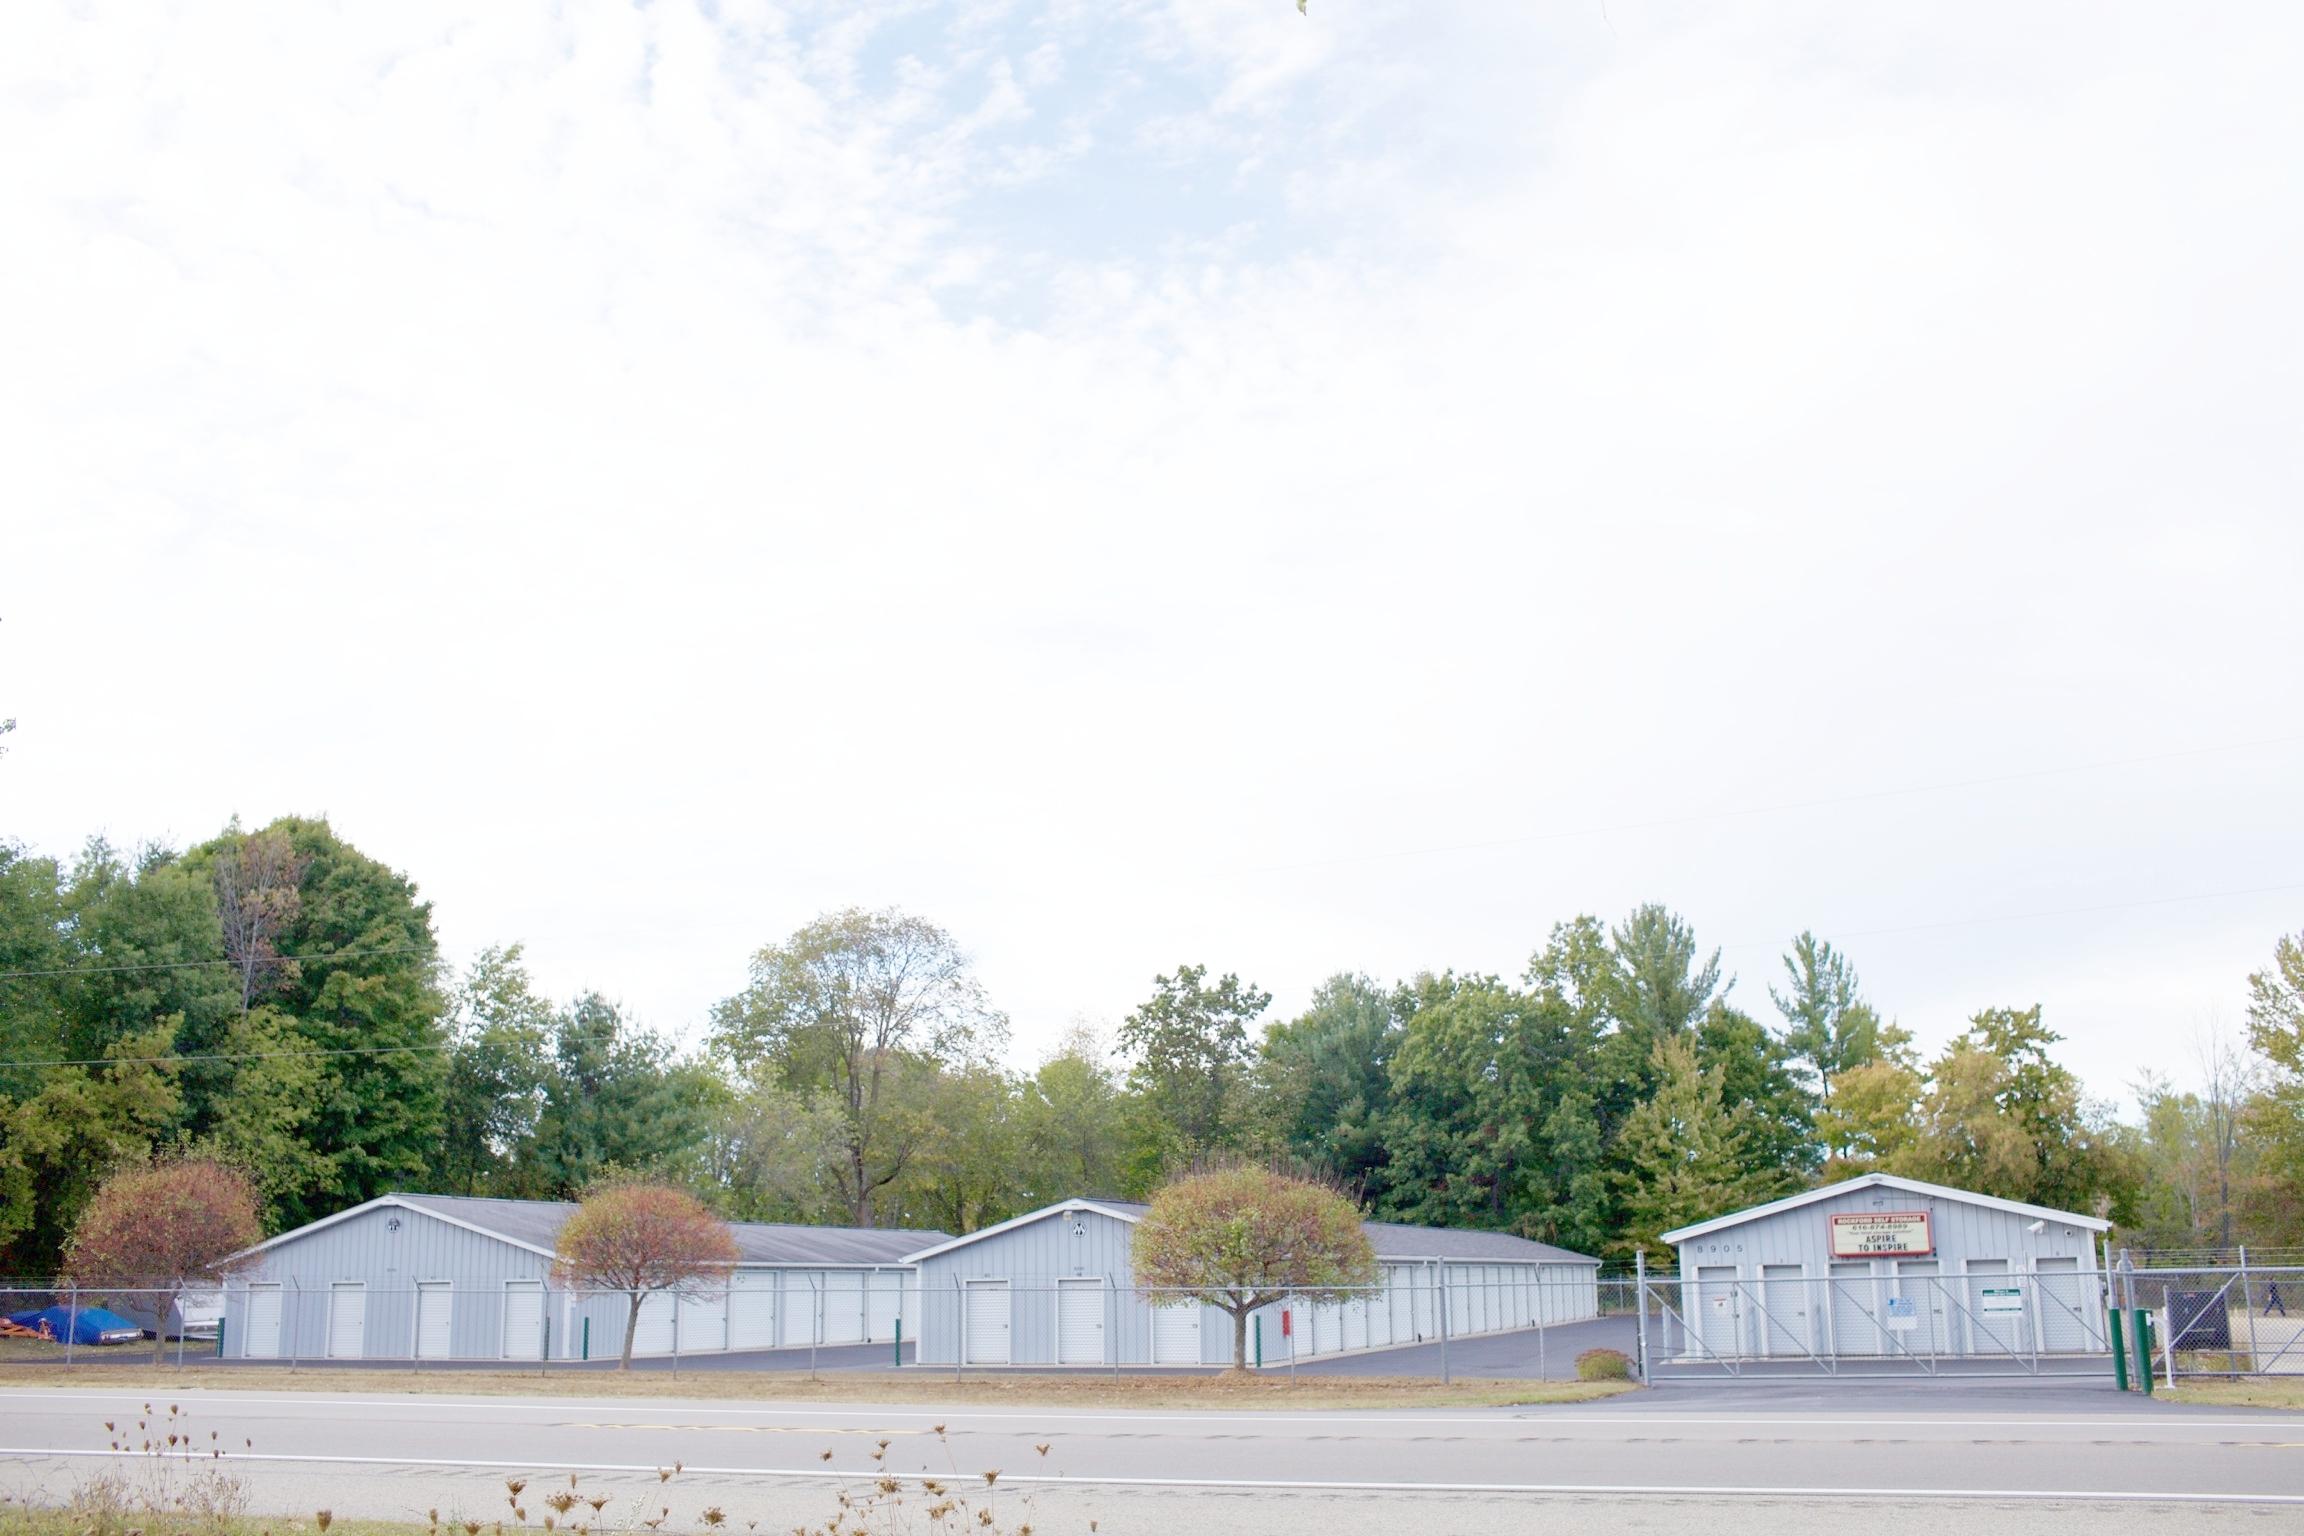 Rockford Self Storage East Location (Bostwick Lake) - 8905 Belding rd. Rockford, MI 49341